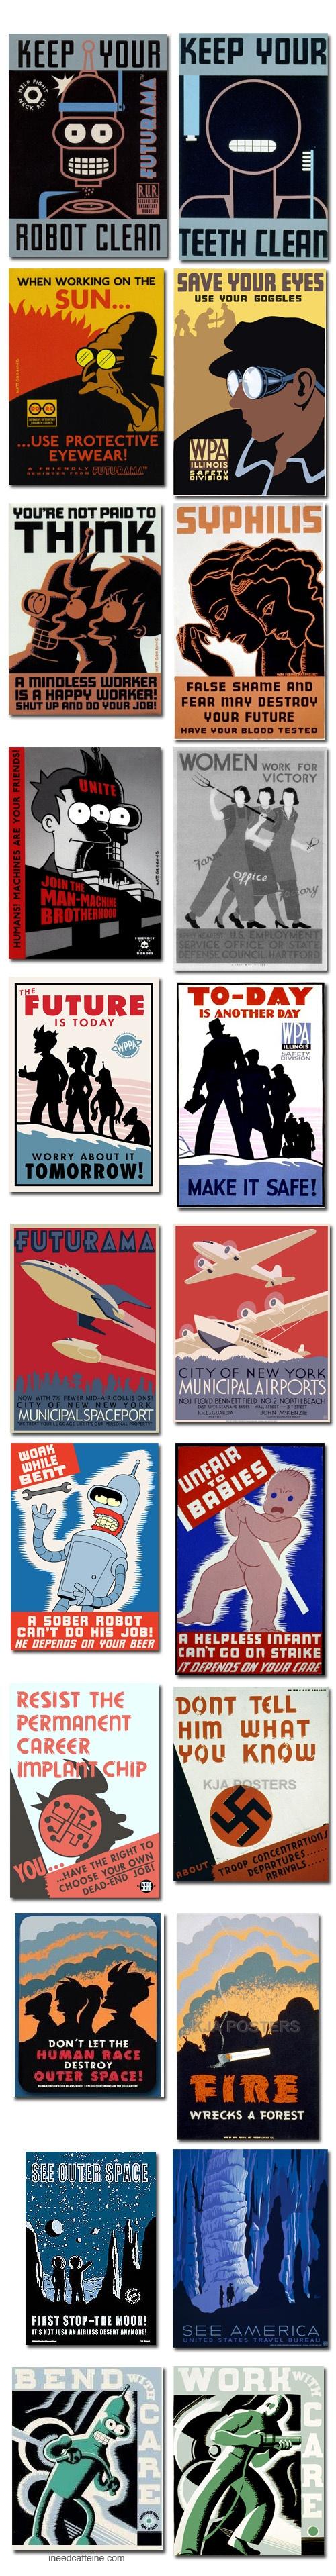 WPA versus Futurama